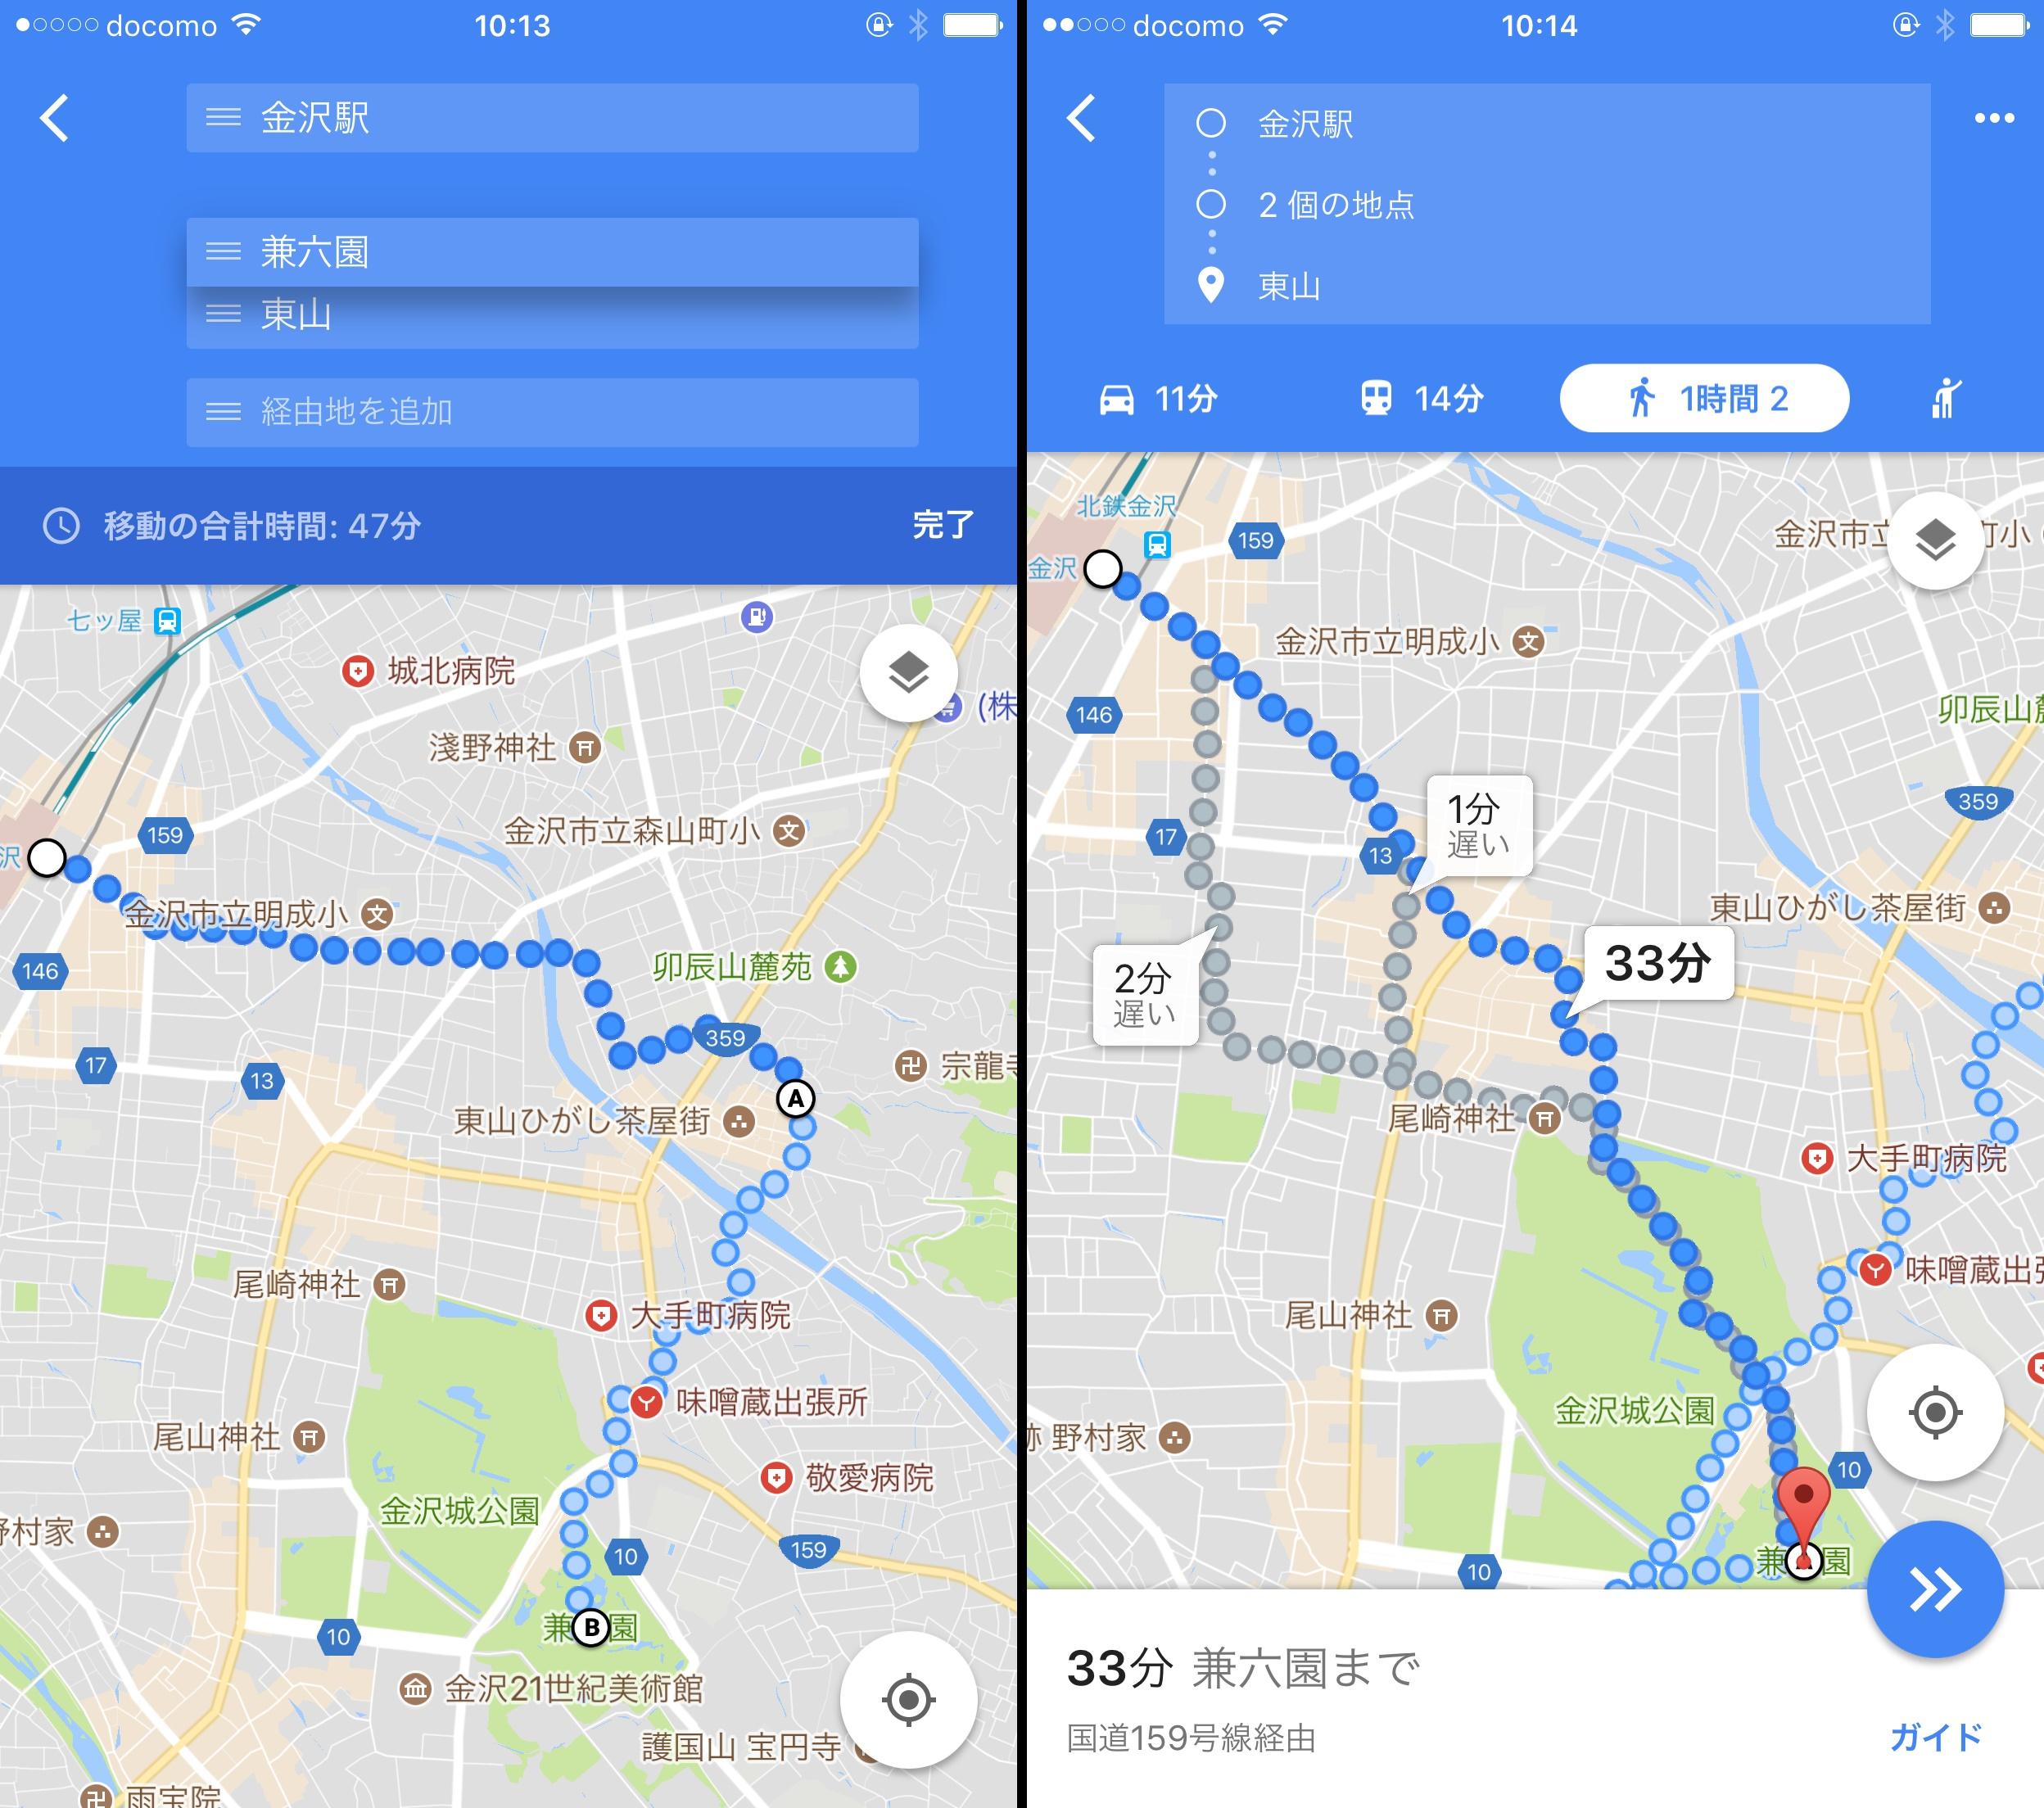 Engadget Japanese日本版旅行ルート作りの効率アップ!! Googleマップの「経由地」で訪問場所をまとめて入力しよう:Google Tips